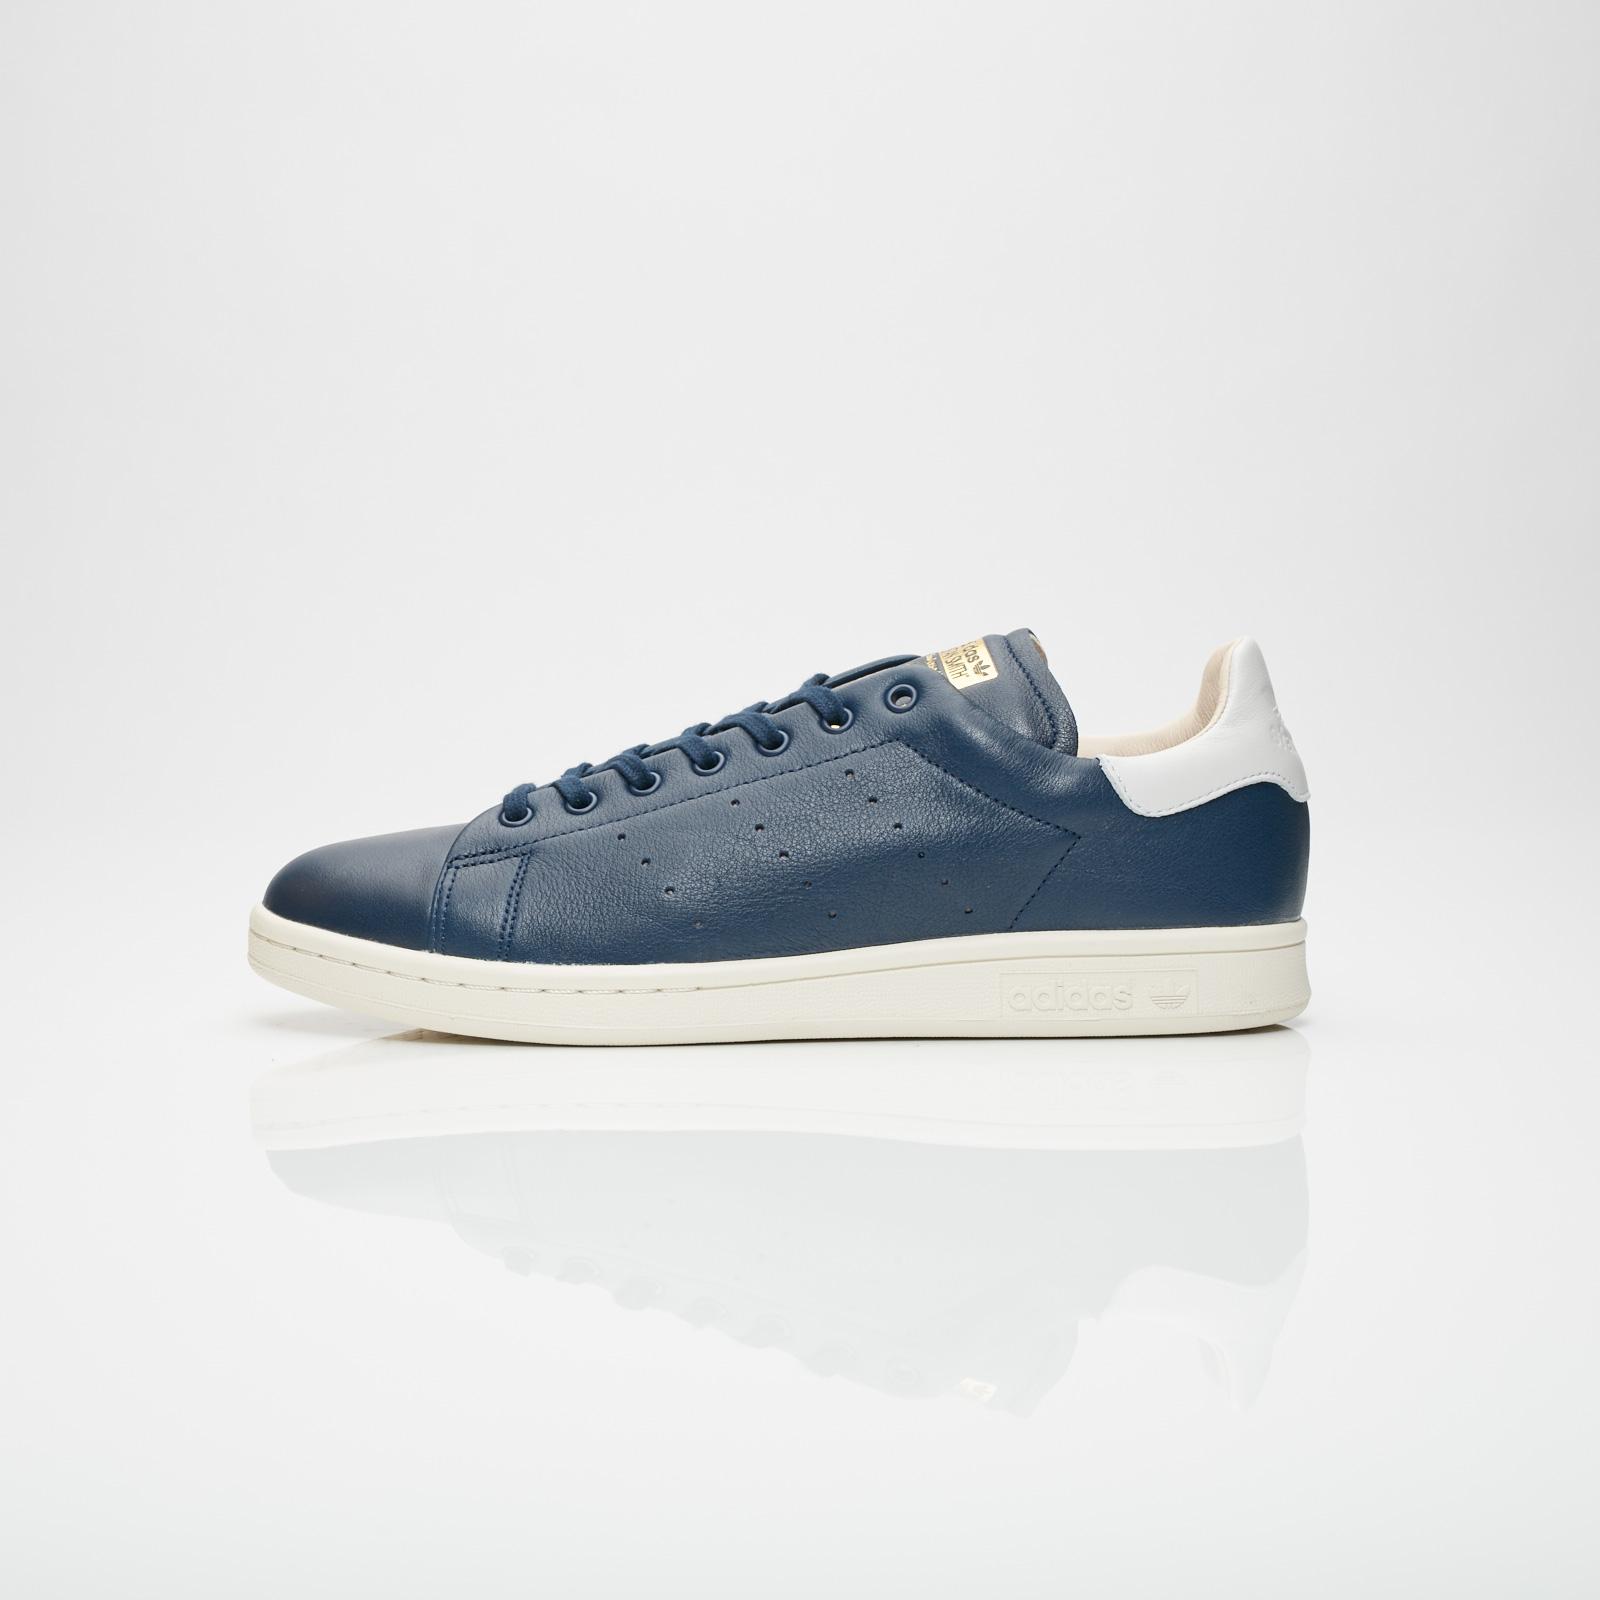 brand new ad6d1 9eb44 adidas Originals Stan Smith Recon - 7. Stäng